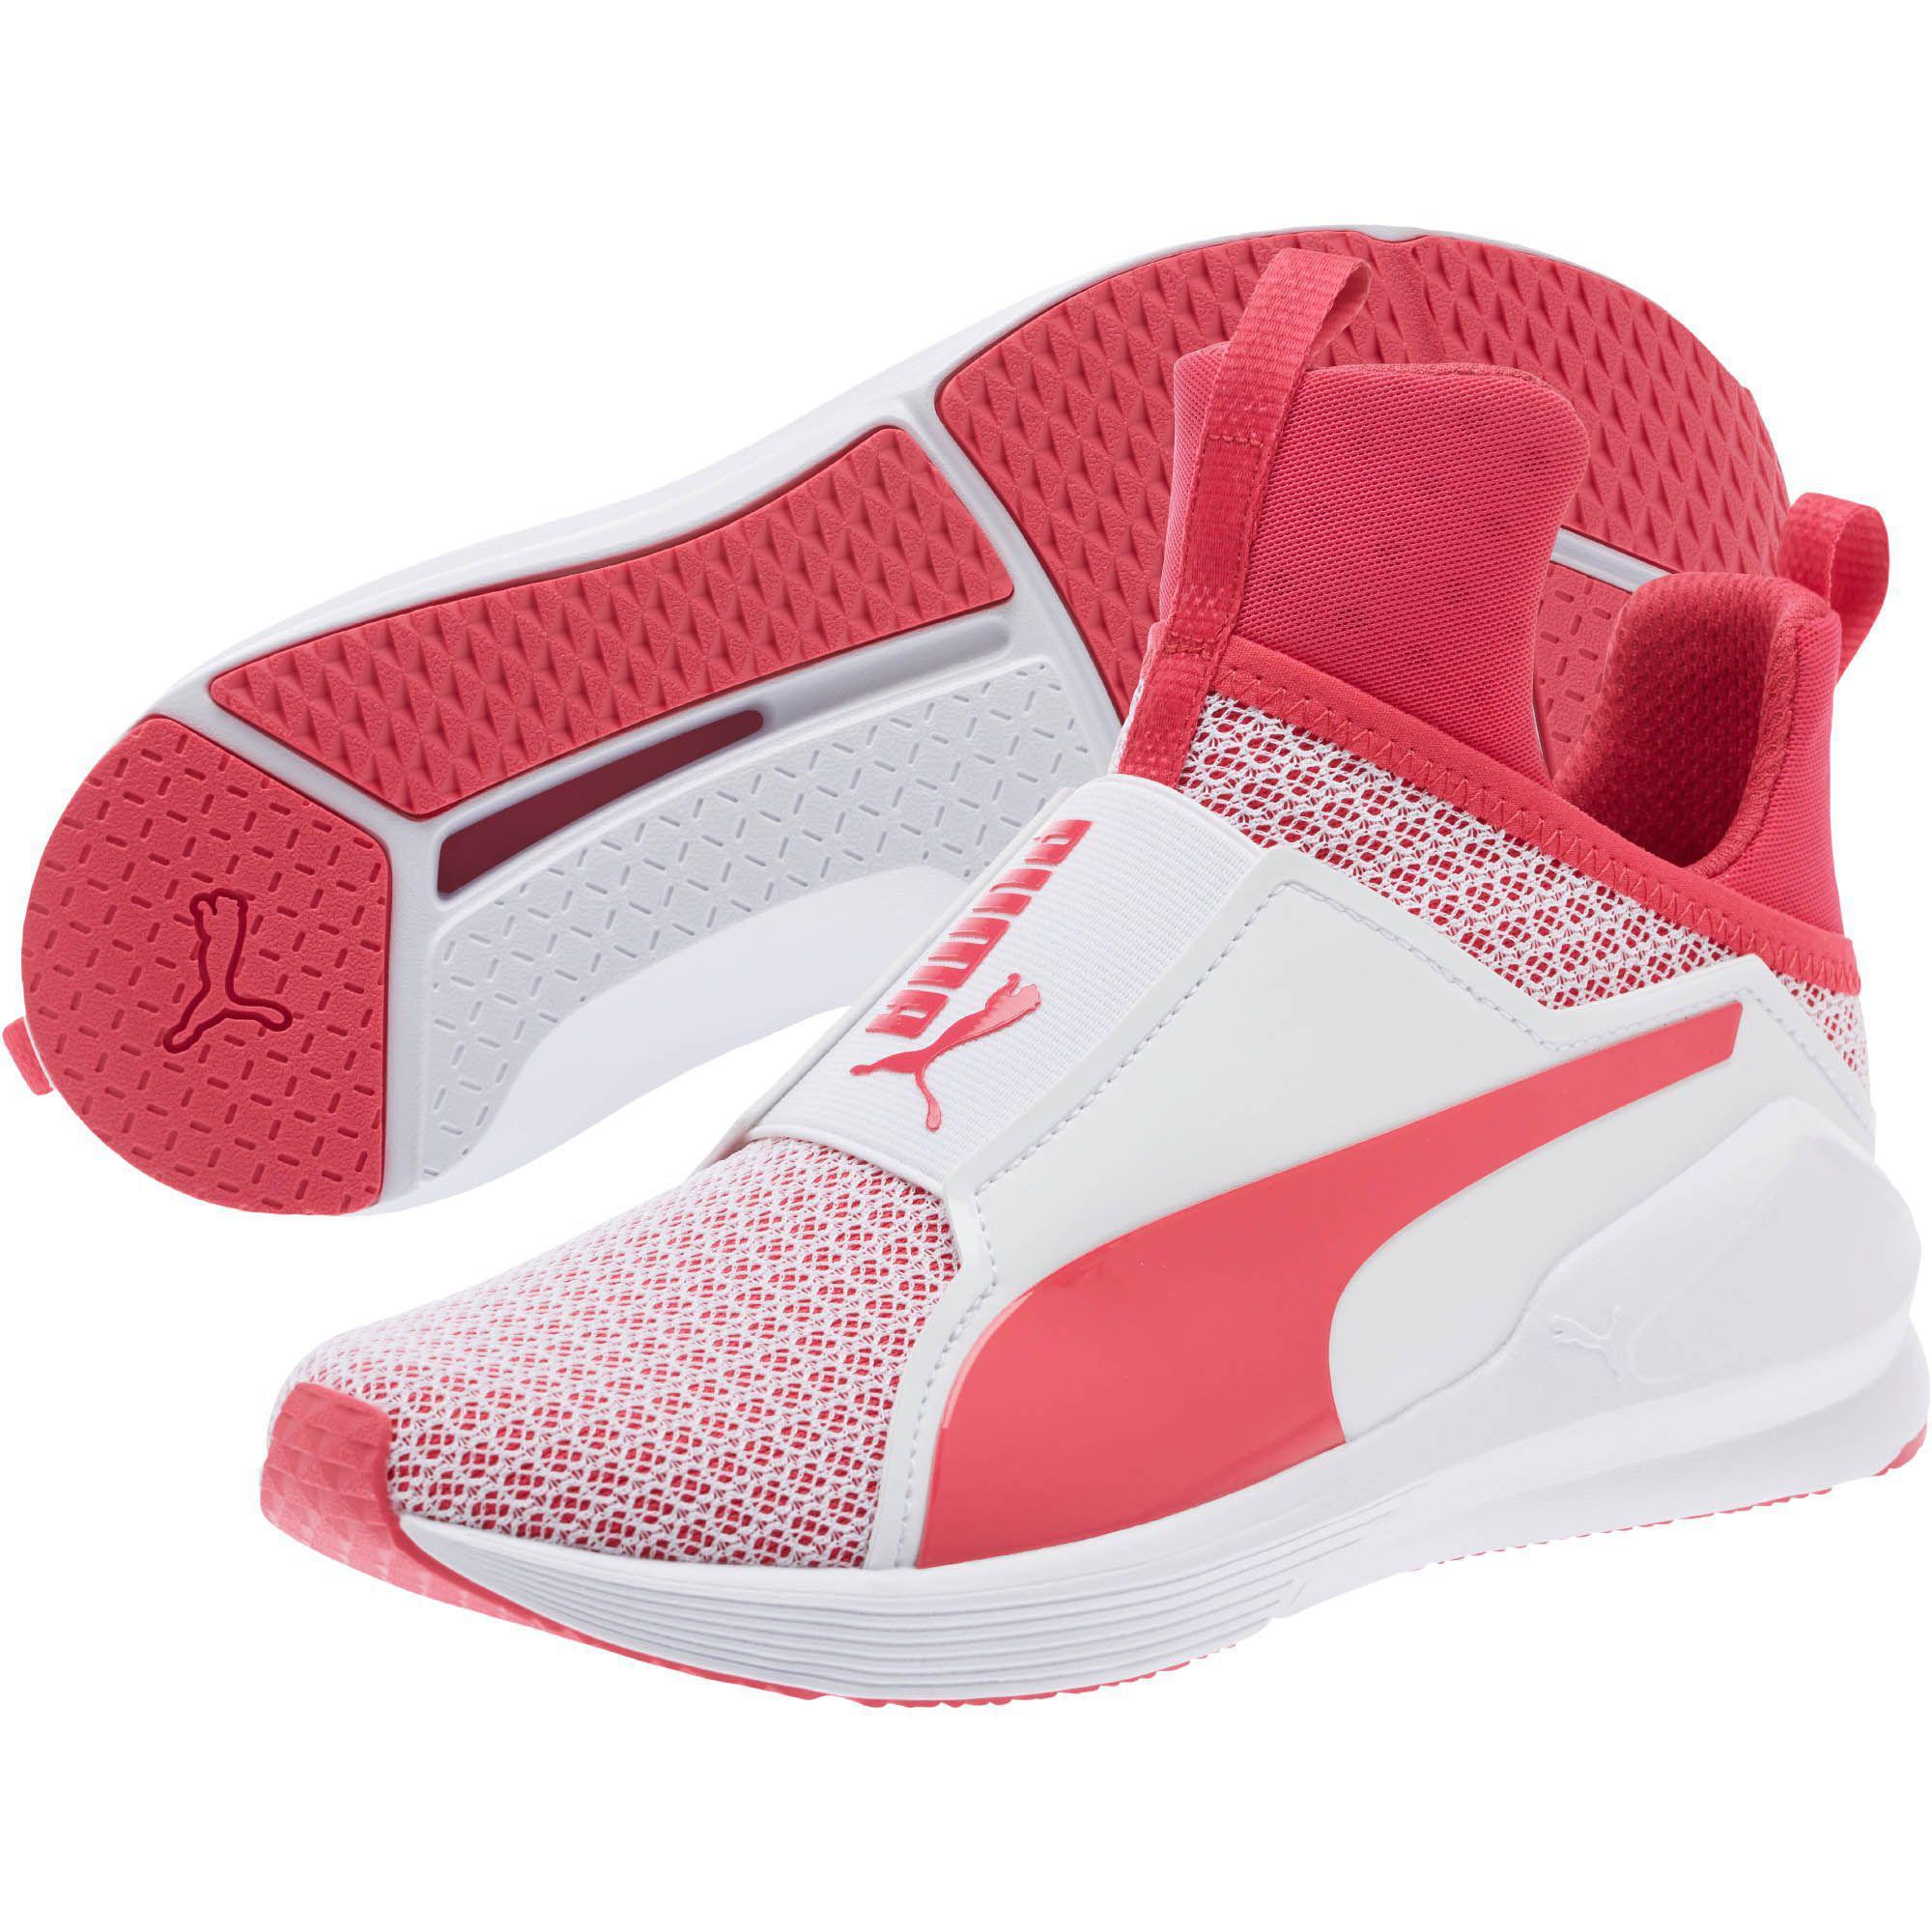 Lyst - Puma Fierce Culture Surf Women s Training Shoes 2df084473